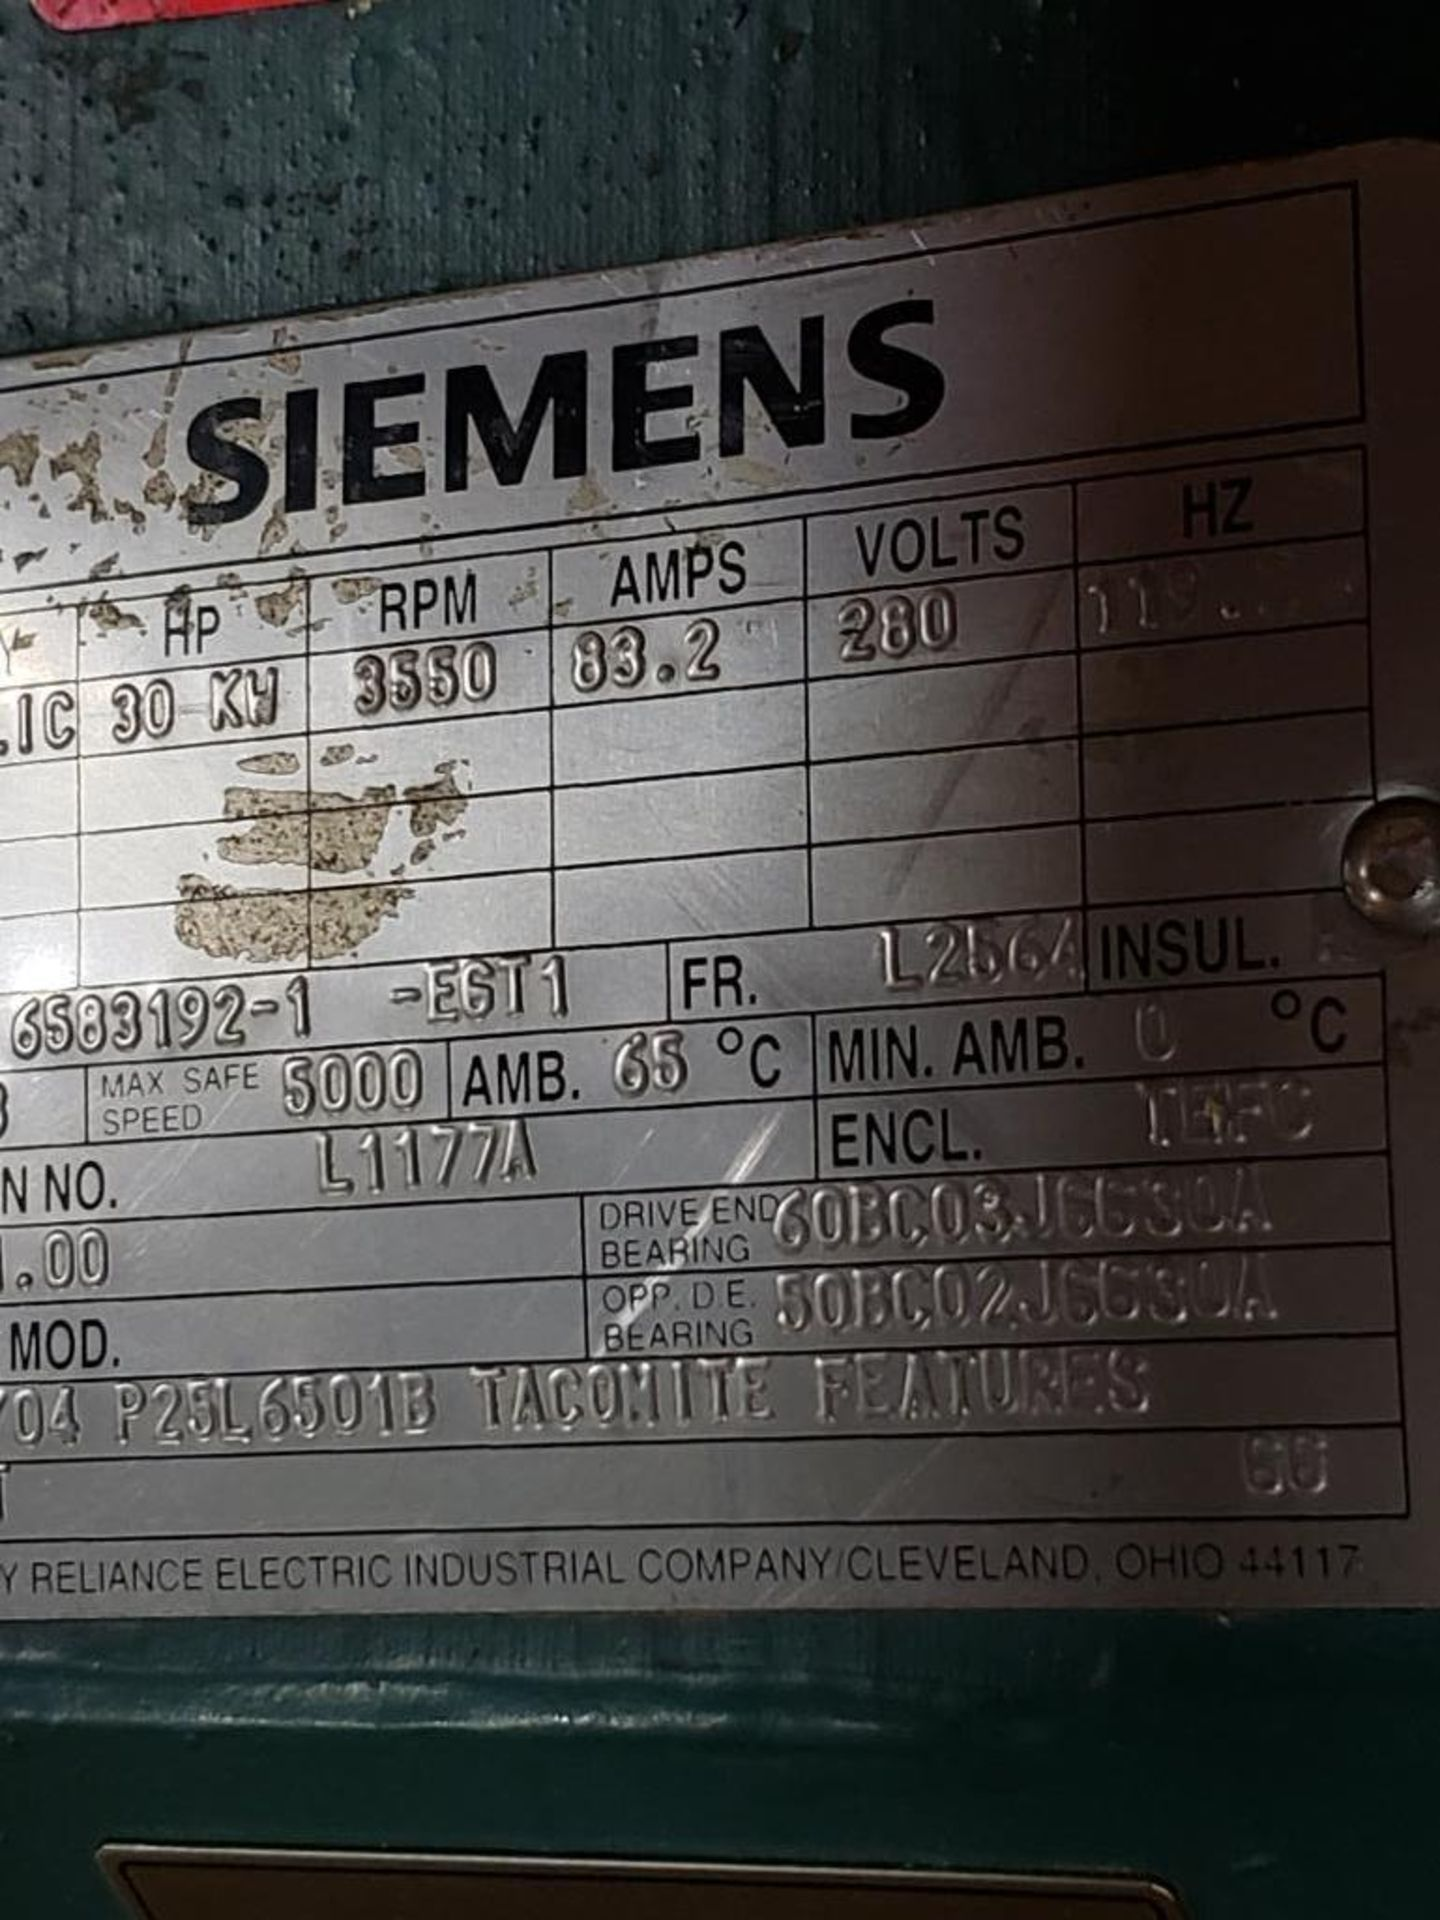 30kW Siemens 3PH Motor. 6583192-1-EGT1. 280V, 3550RM, L2564-Frame. - Image 4 of 7